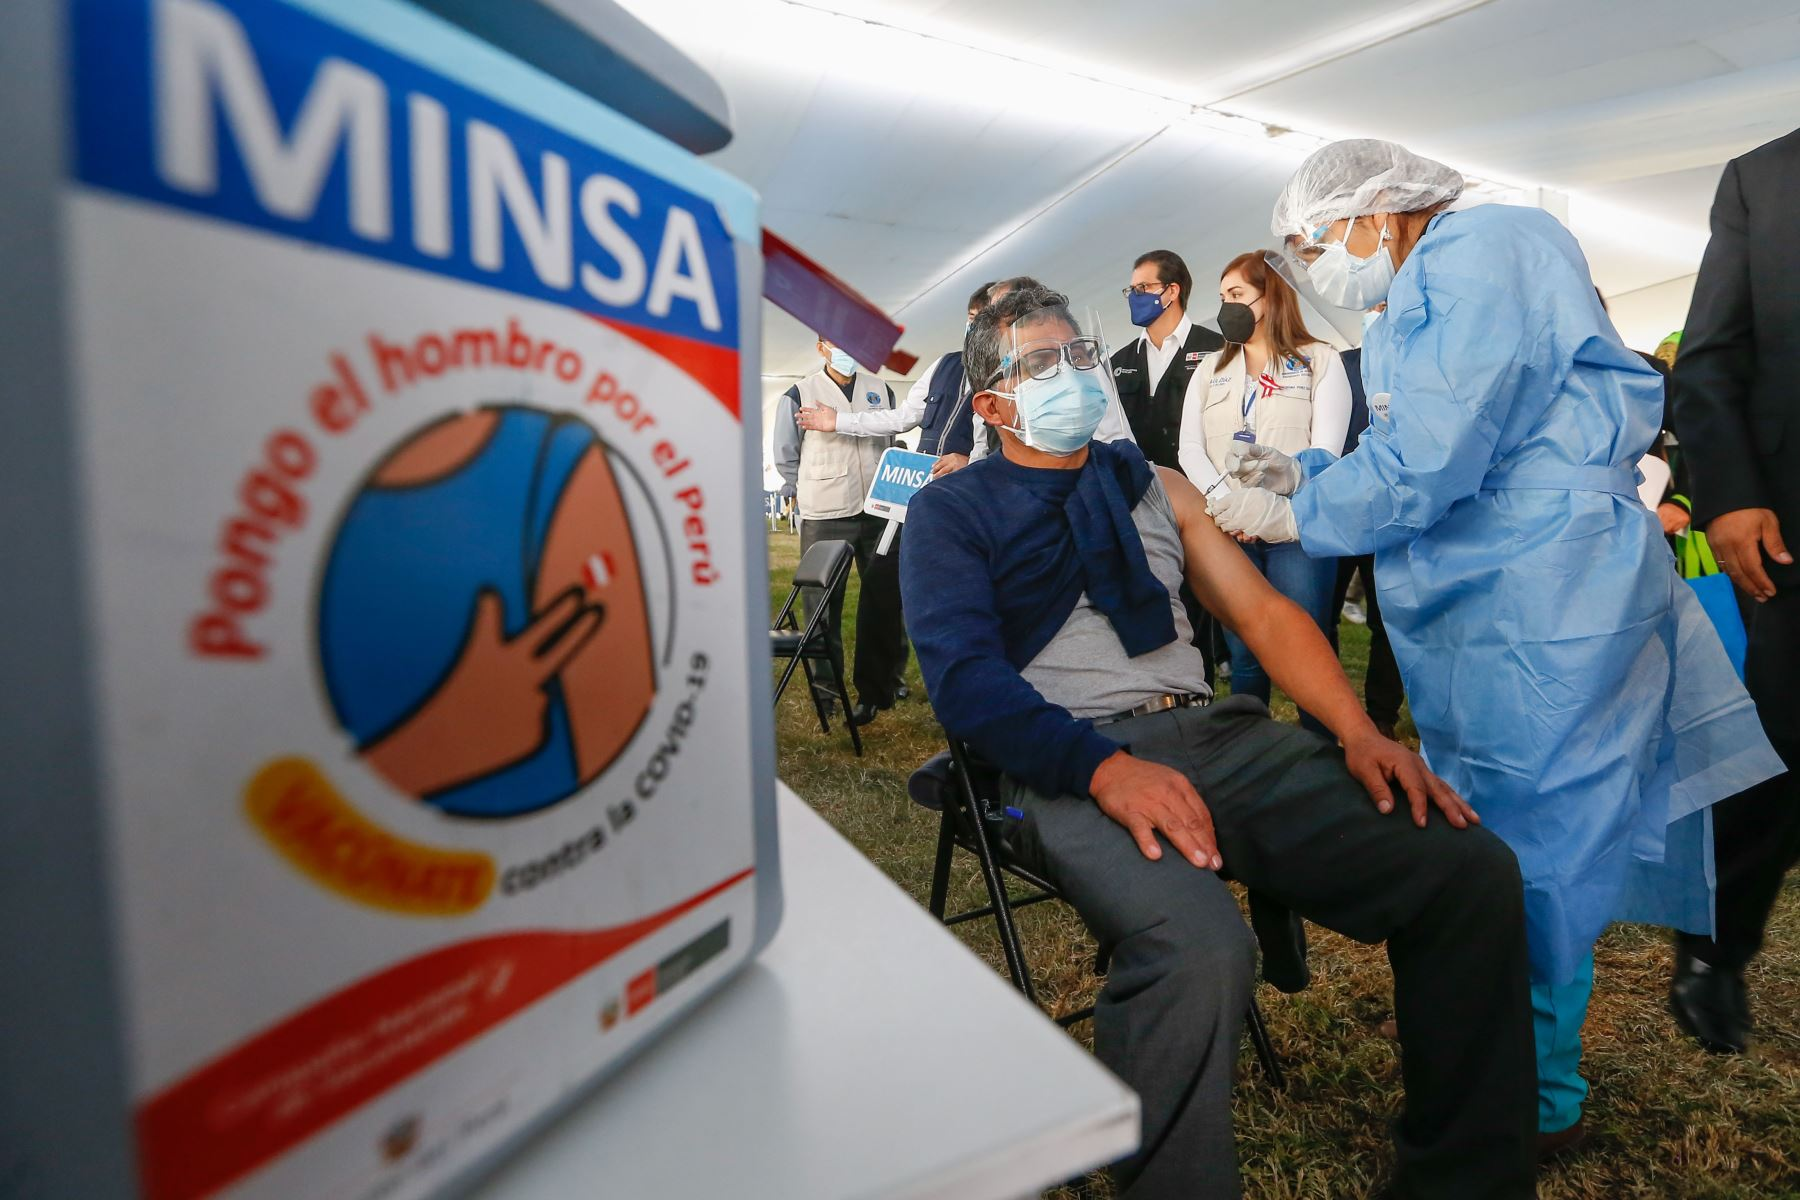 Minsa: Perú aplicó hasta hoy 9 millones 721,454 dosis contra la covid-19